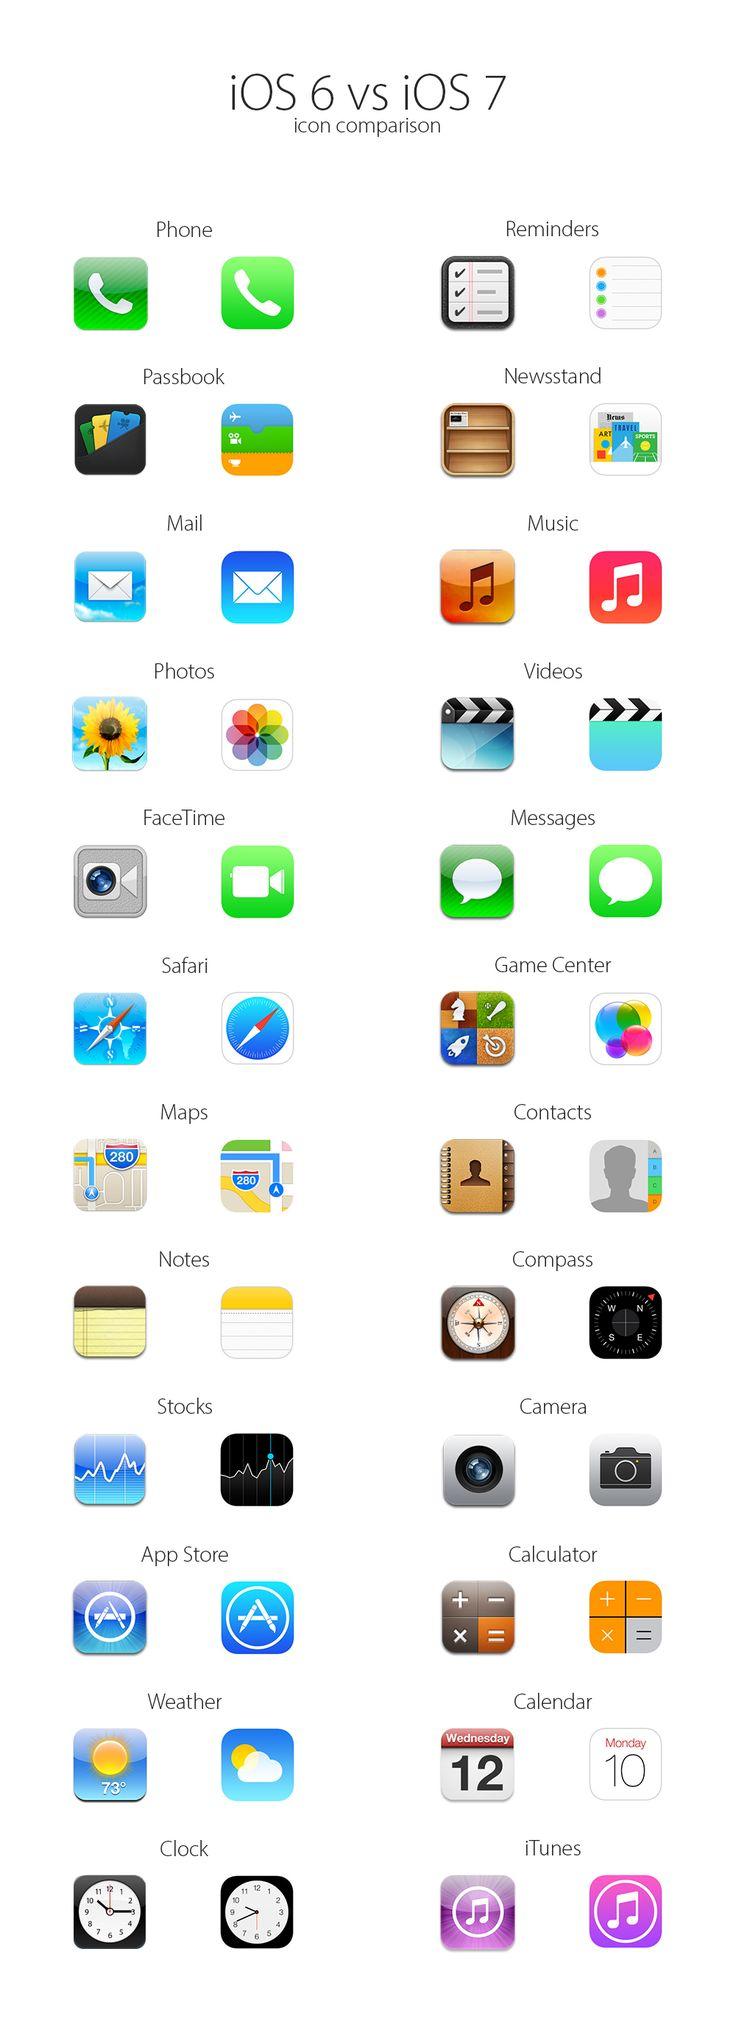 iOS 6 vs iOS 7: icon comparition #infographic I'm kinda sad :(